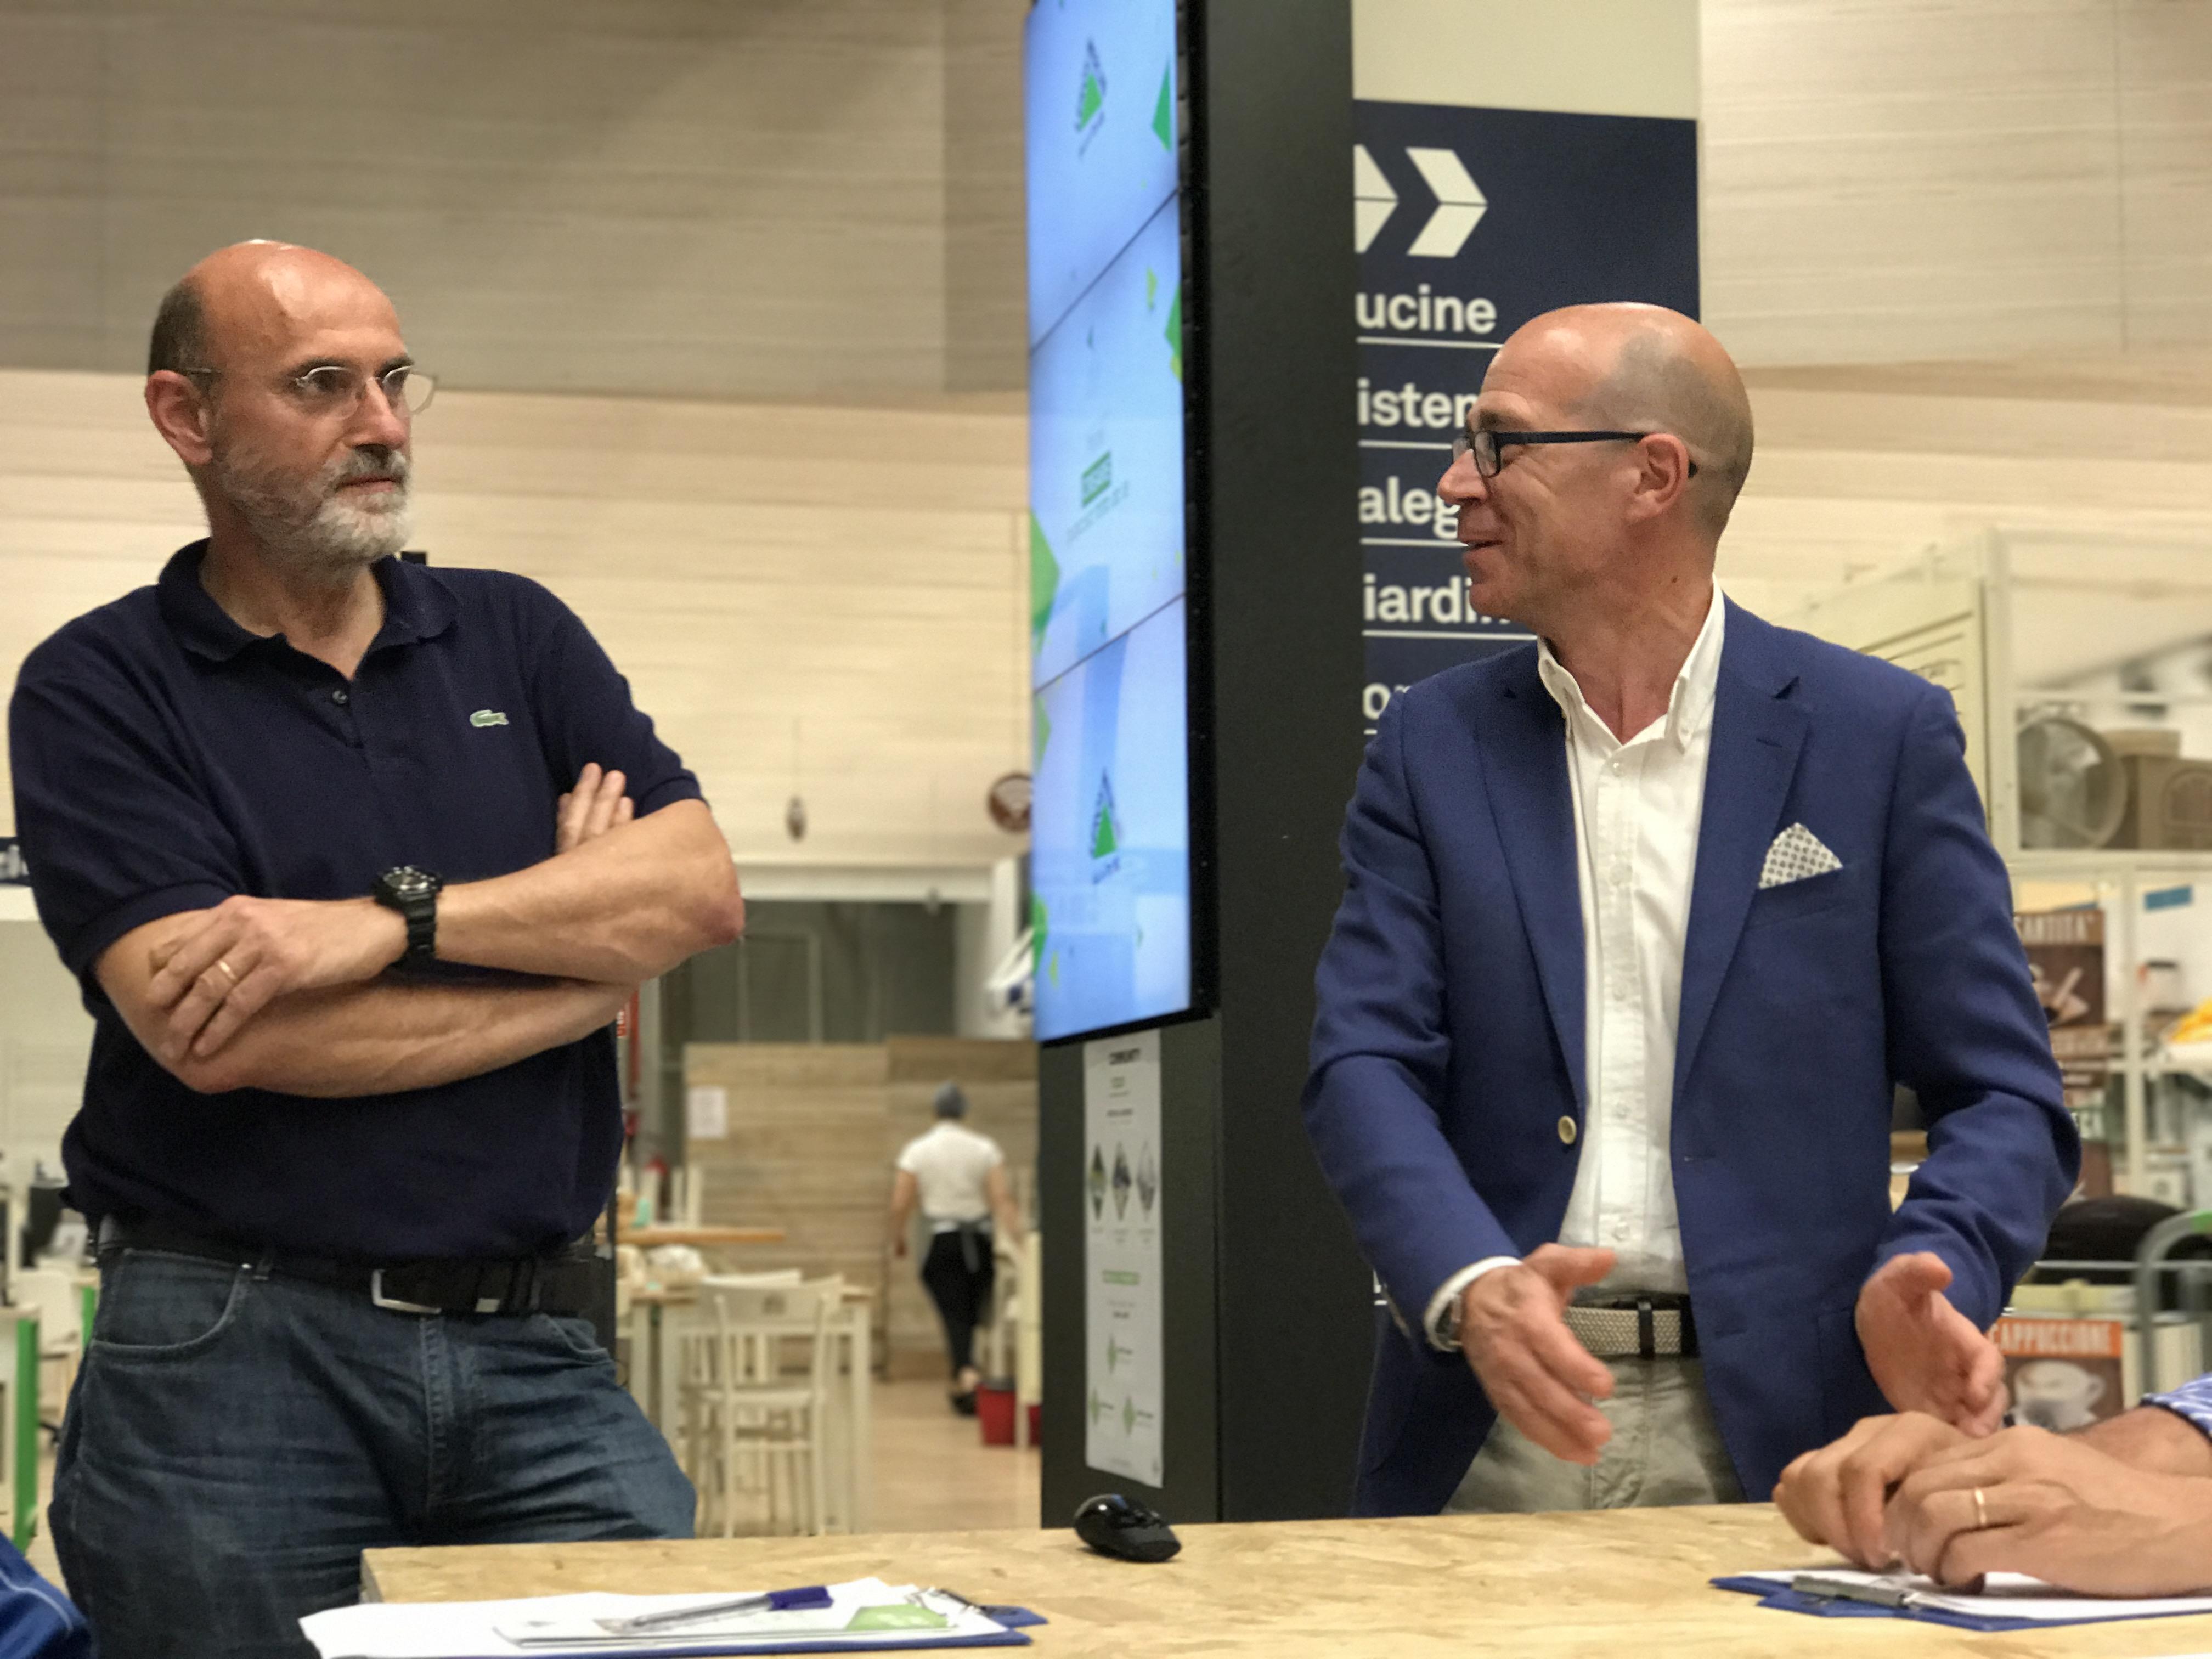 Torino giulio cesare casaclima network piemonte valle d for Casaclima 2017